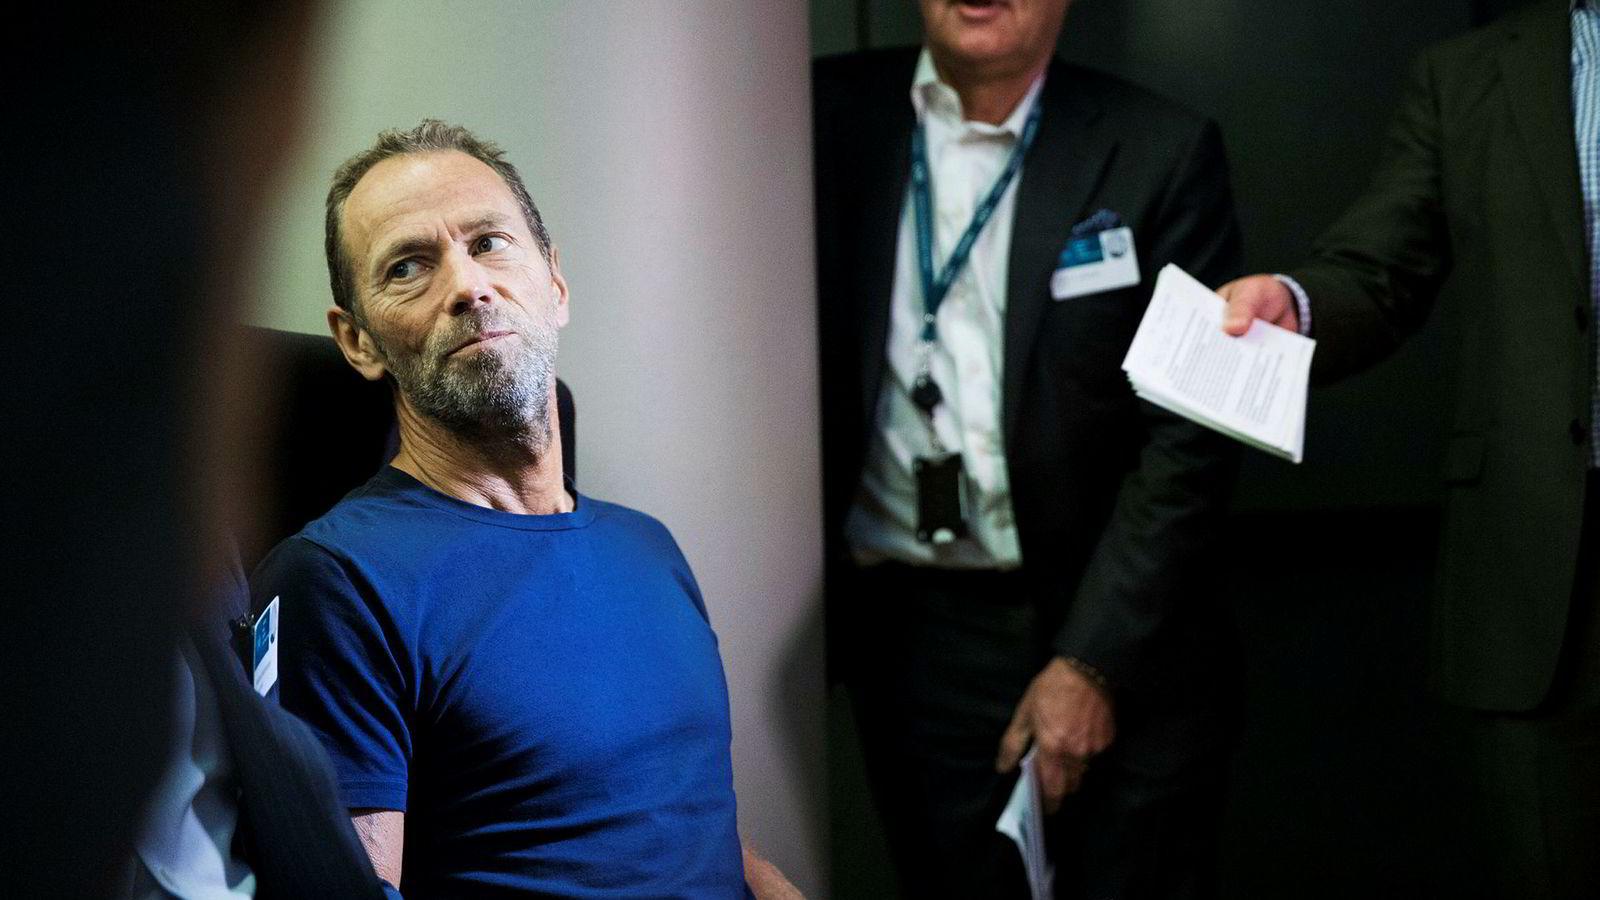 Er milliardær Ivar Tollefsens hukommelse selektiv eller svekket?